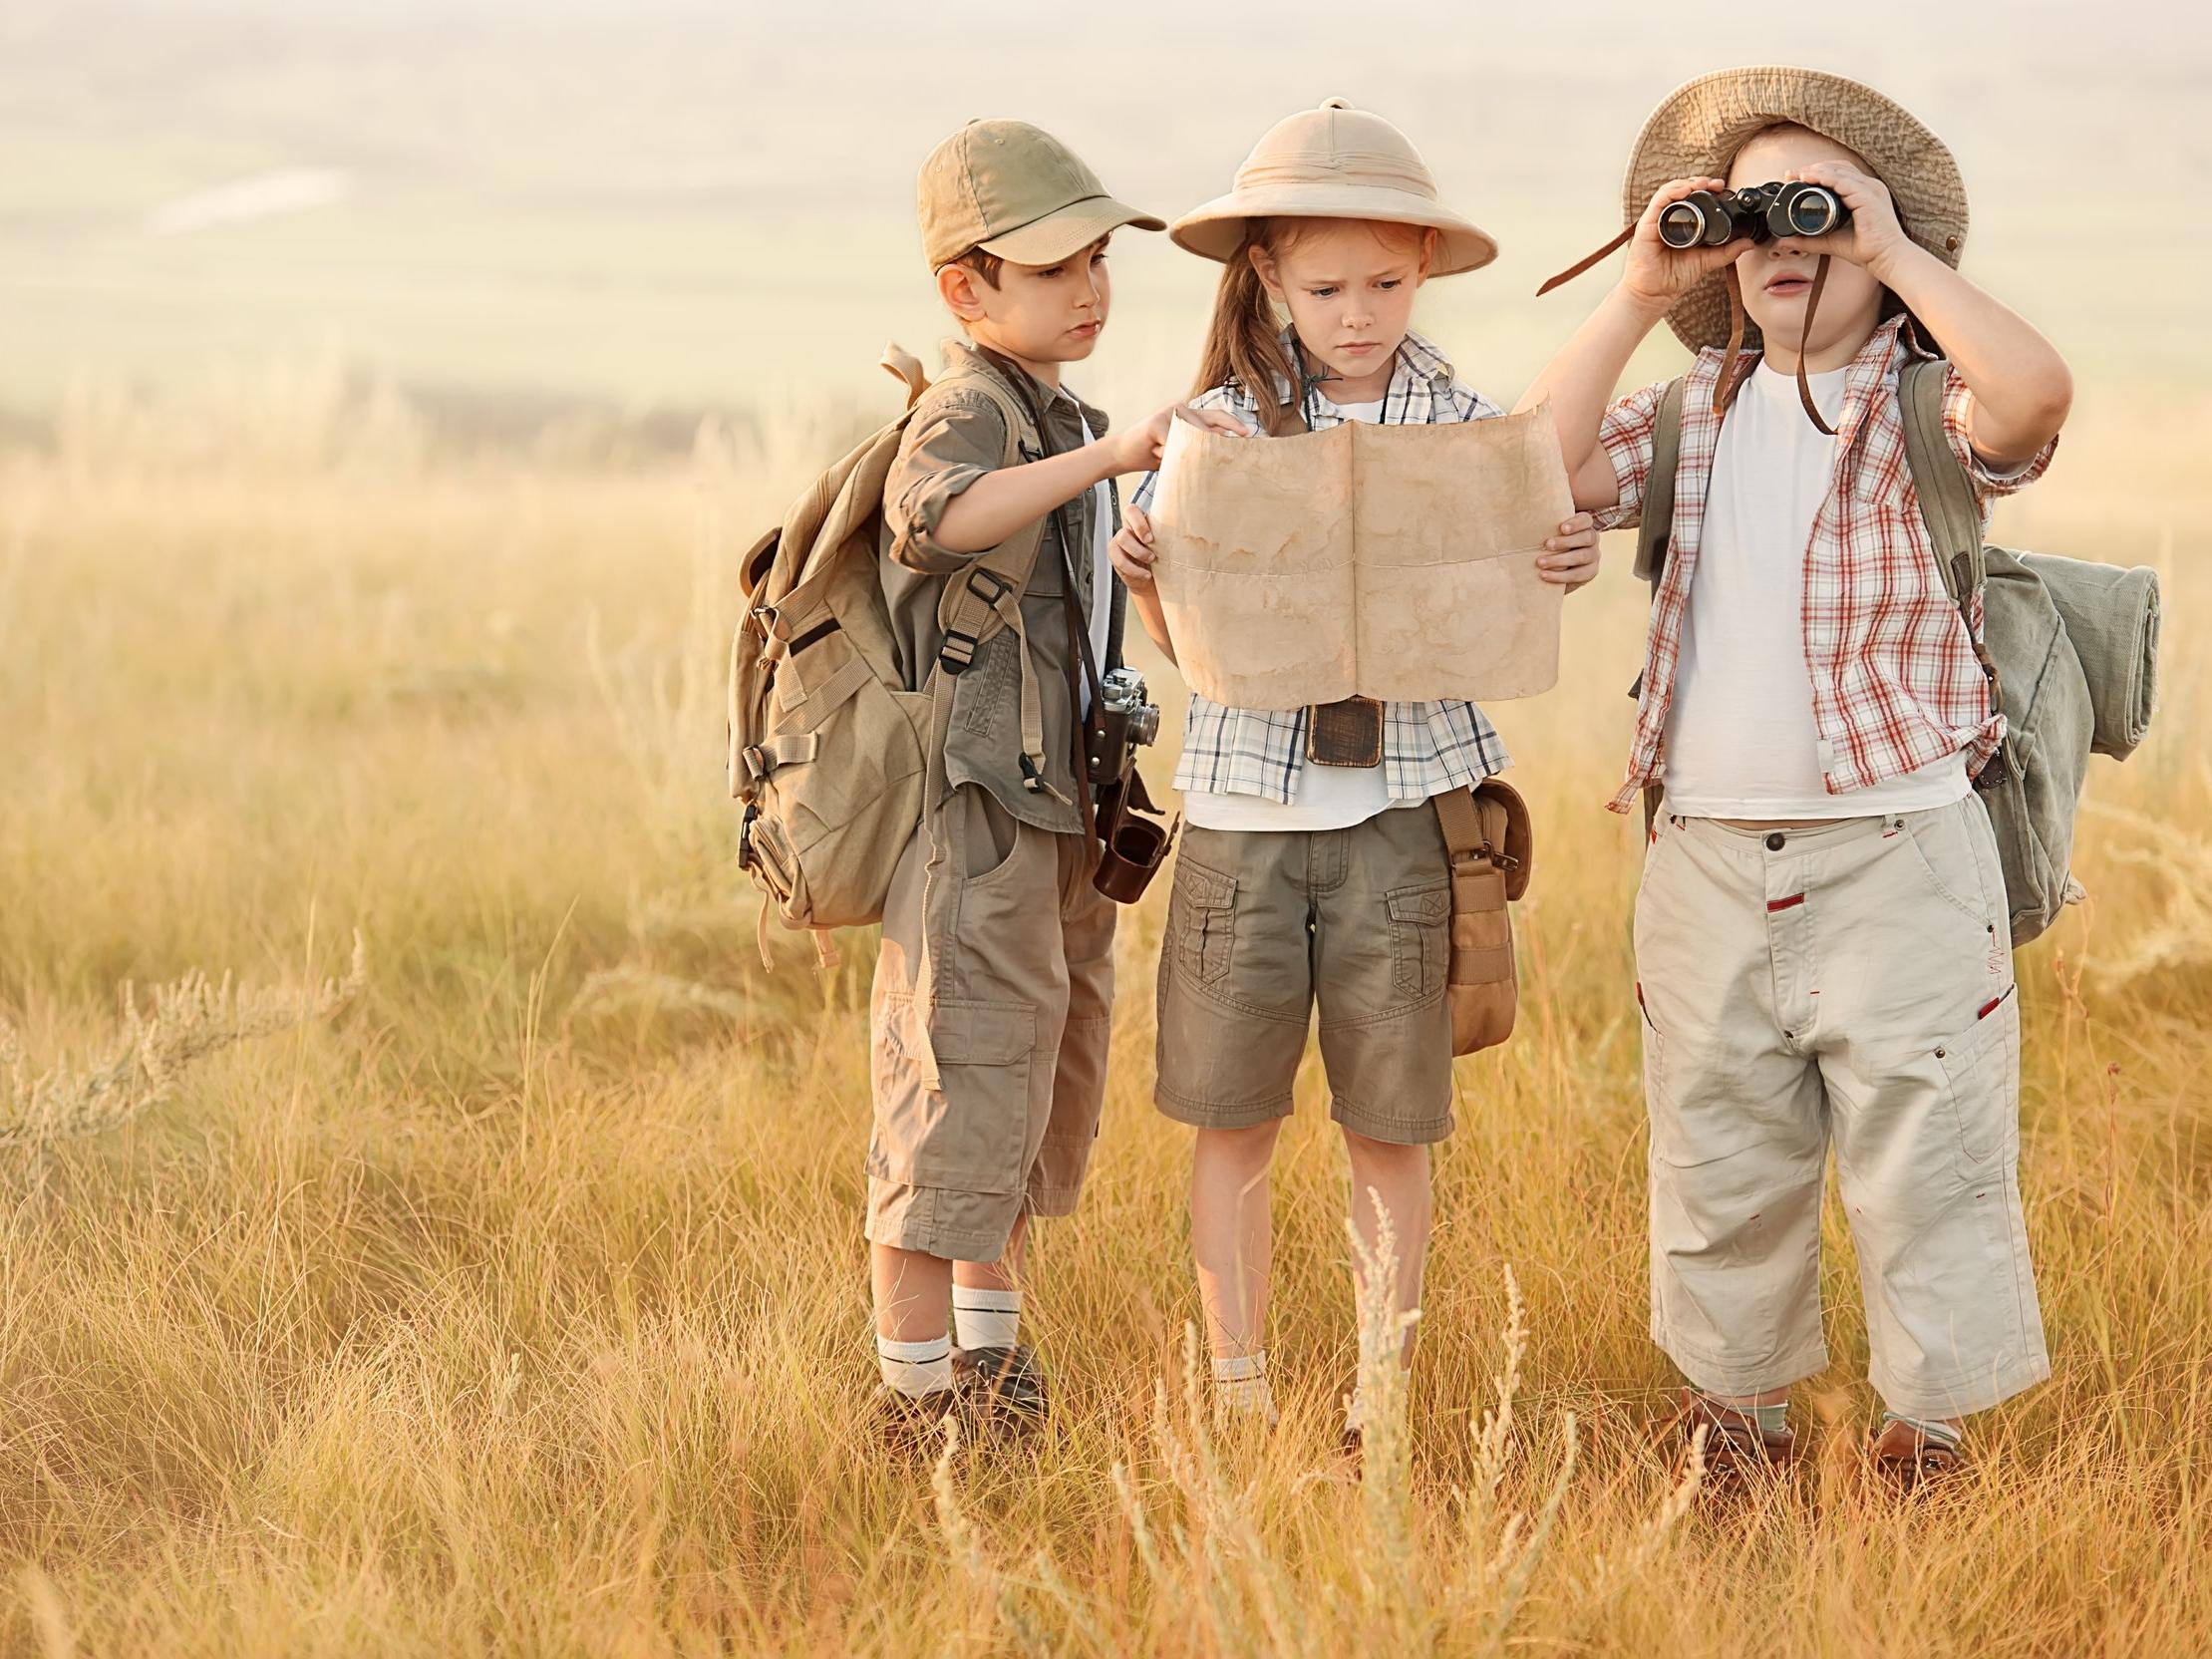 wandermust-family-travel-2.jpg